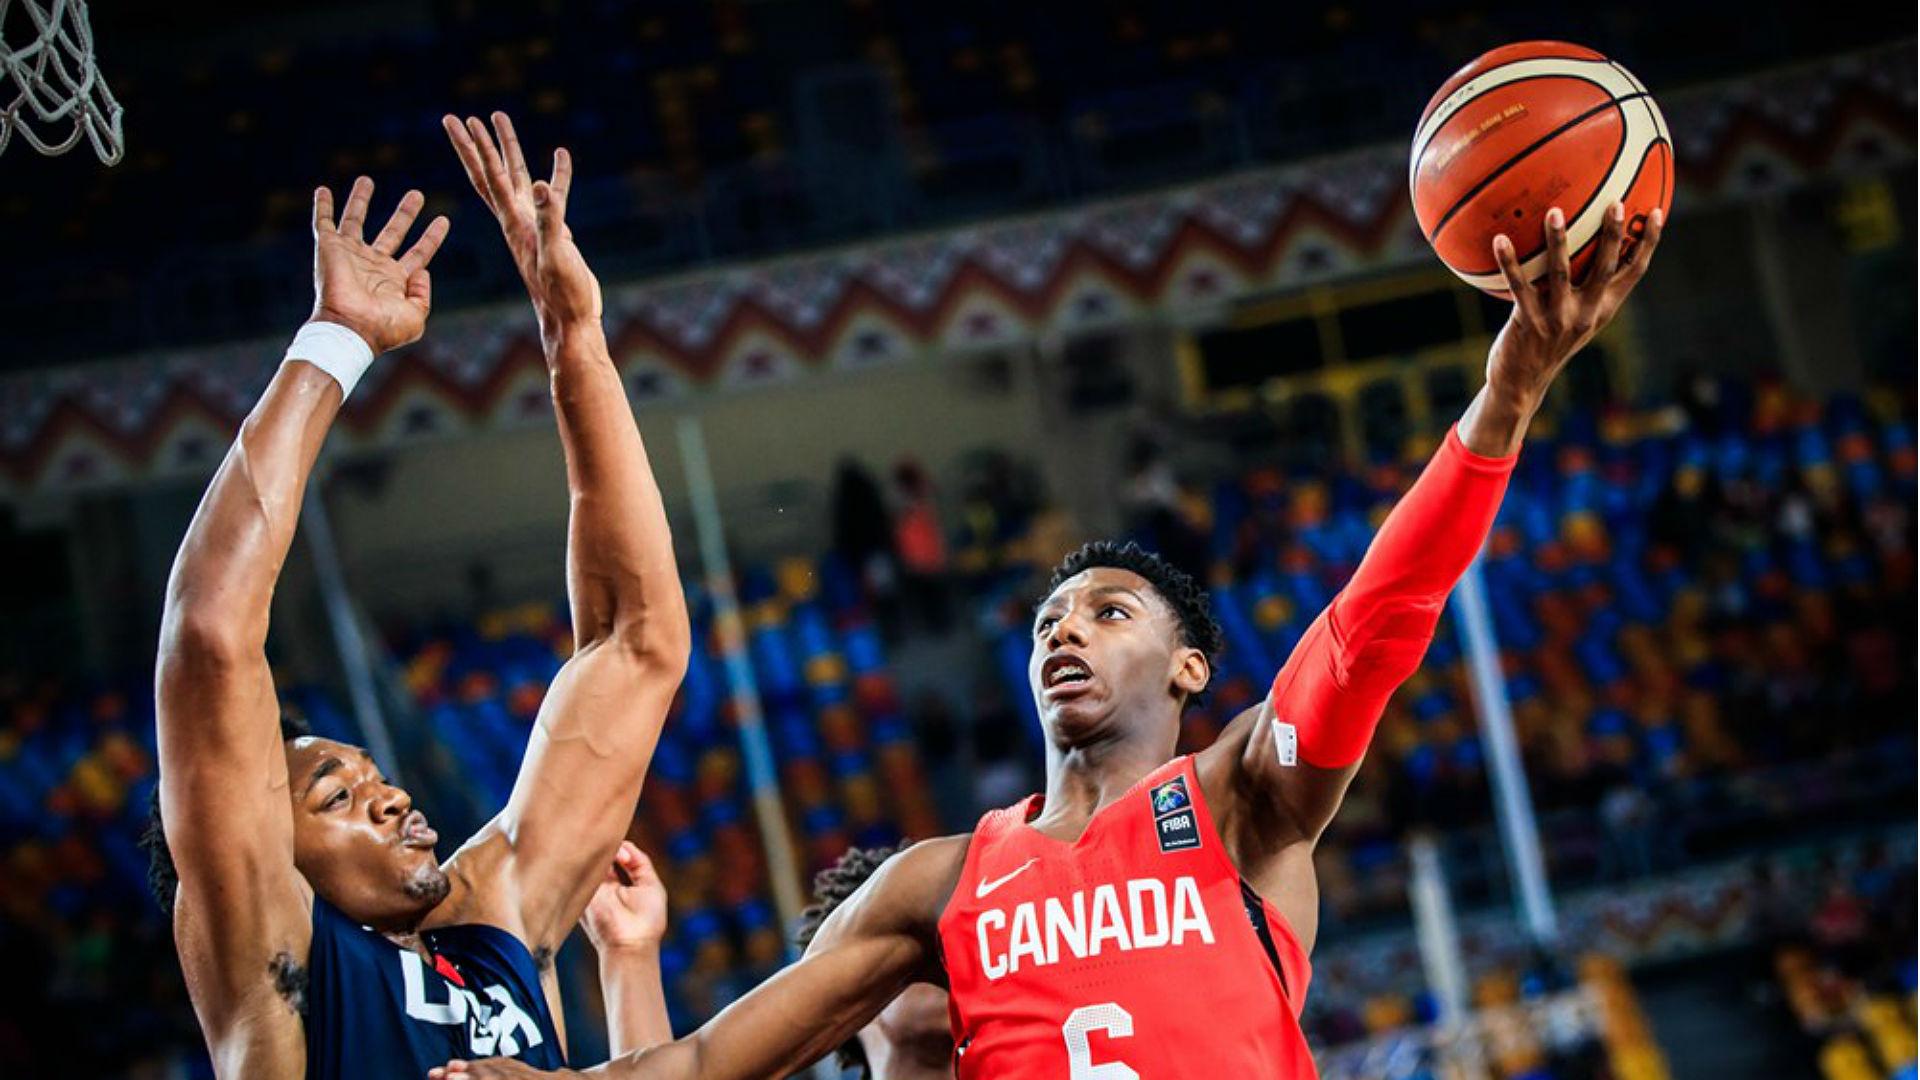 Arizona basketball: Top 2018 prospect RJ Barrett lists UA in top five